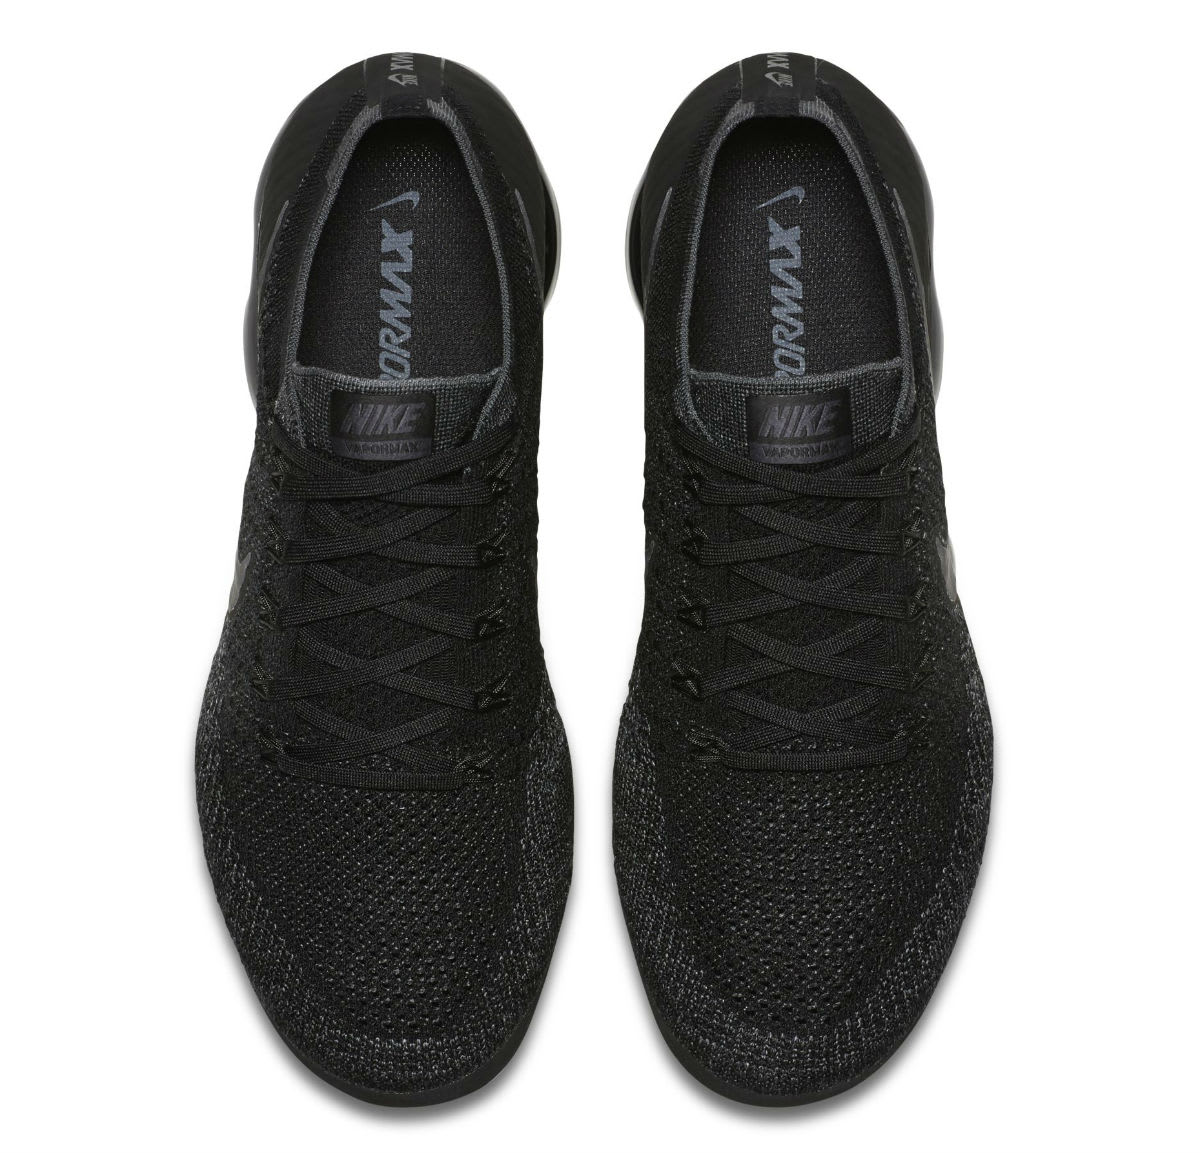 Nike Vapormax Inside